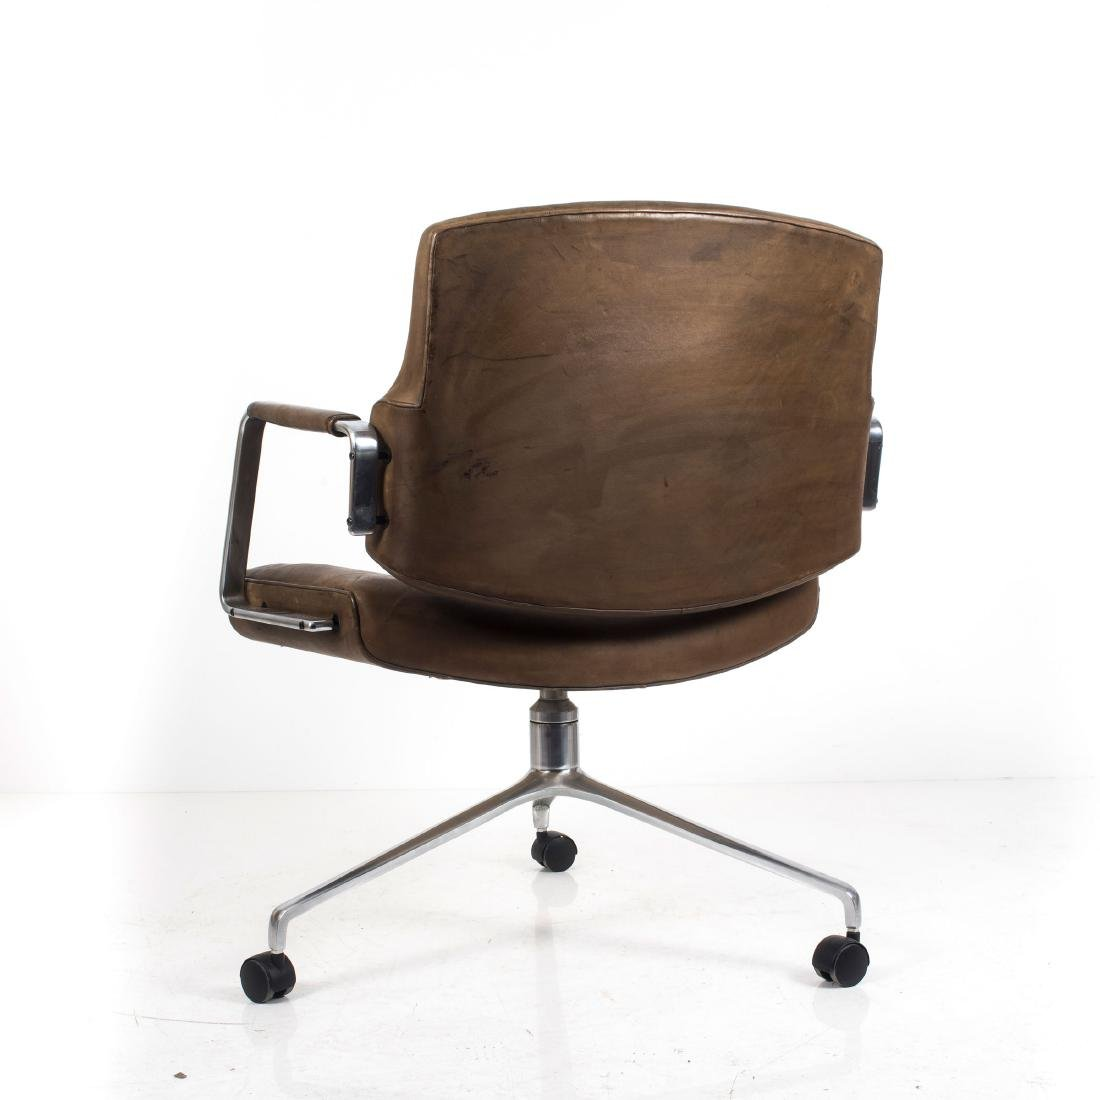 'DK-2' armchair, c. 1965 - 2